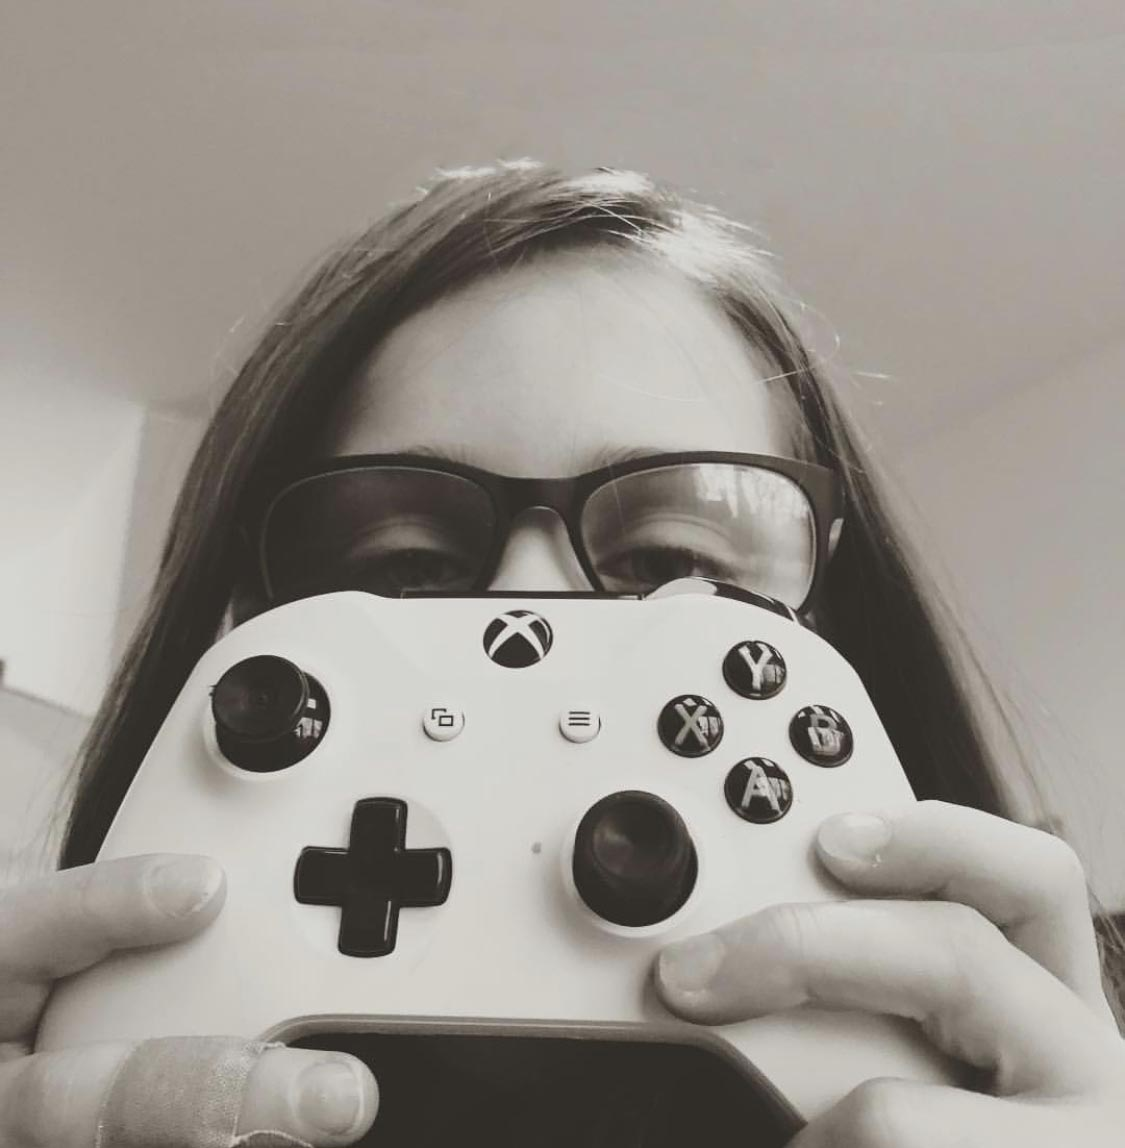 Xbox, Xbox family, dadbloguk